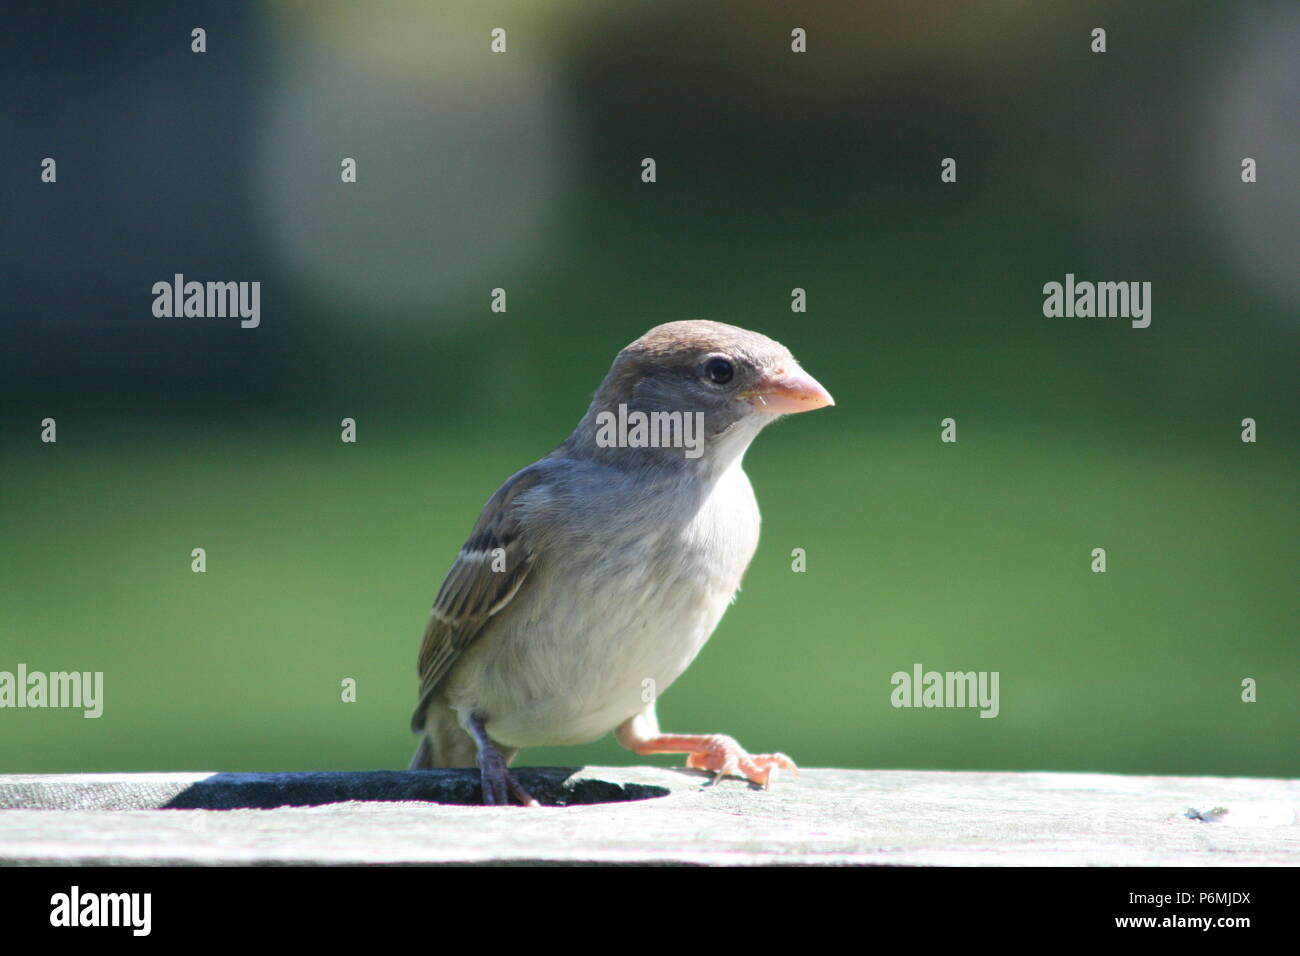 Passer domesticus (House Sparrow) Stock Photo